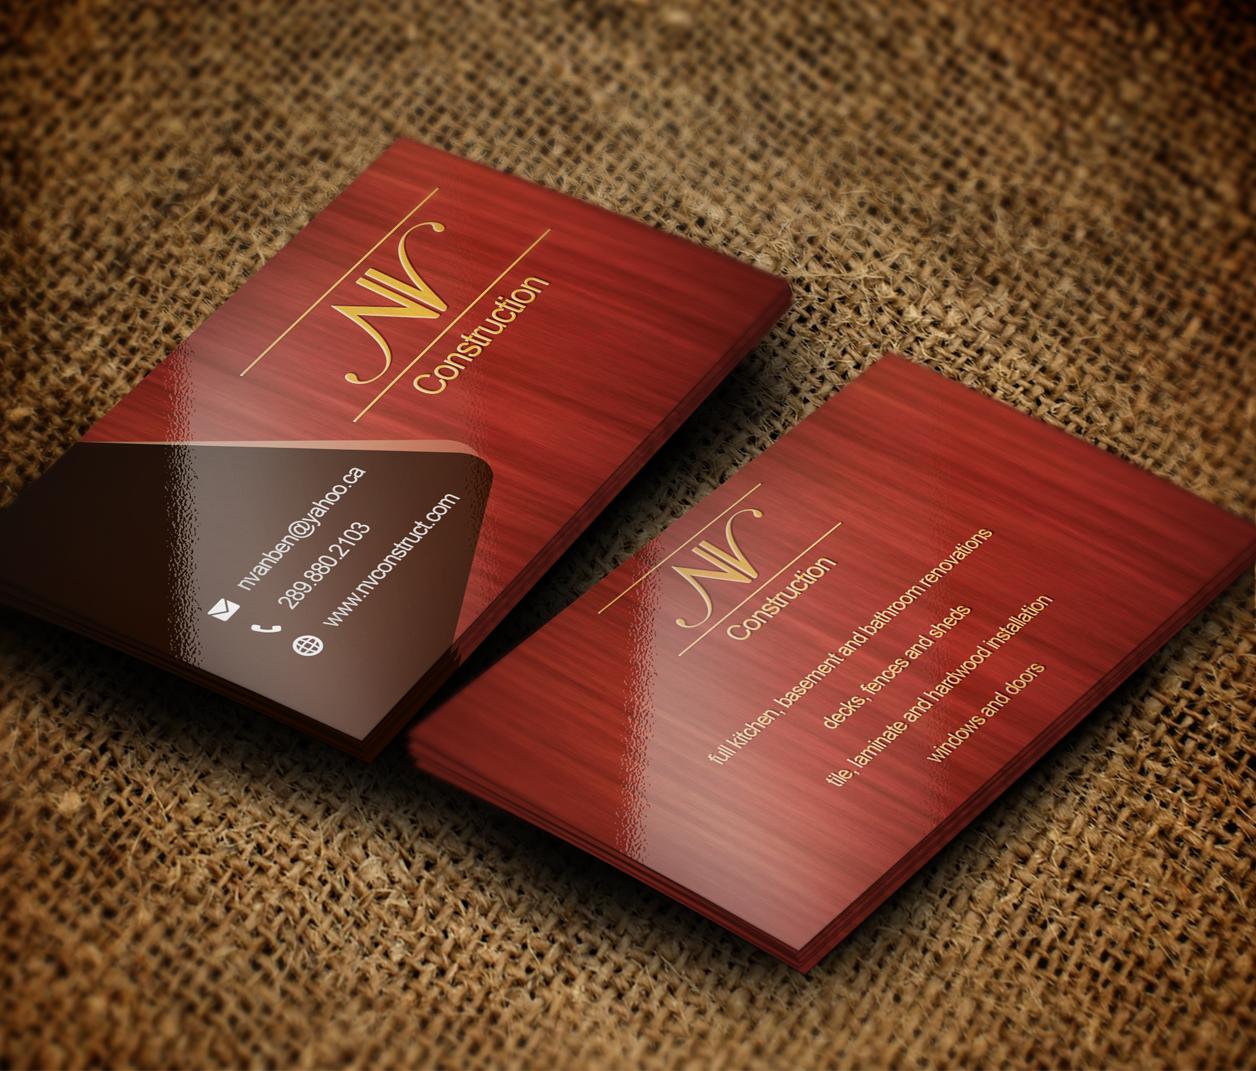 Elegant playful business card design for nate vanbenthem by business card design by stefan for home renovation business needs a logo and business card design magicingreecefo Gallery